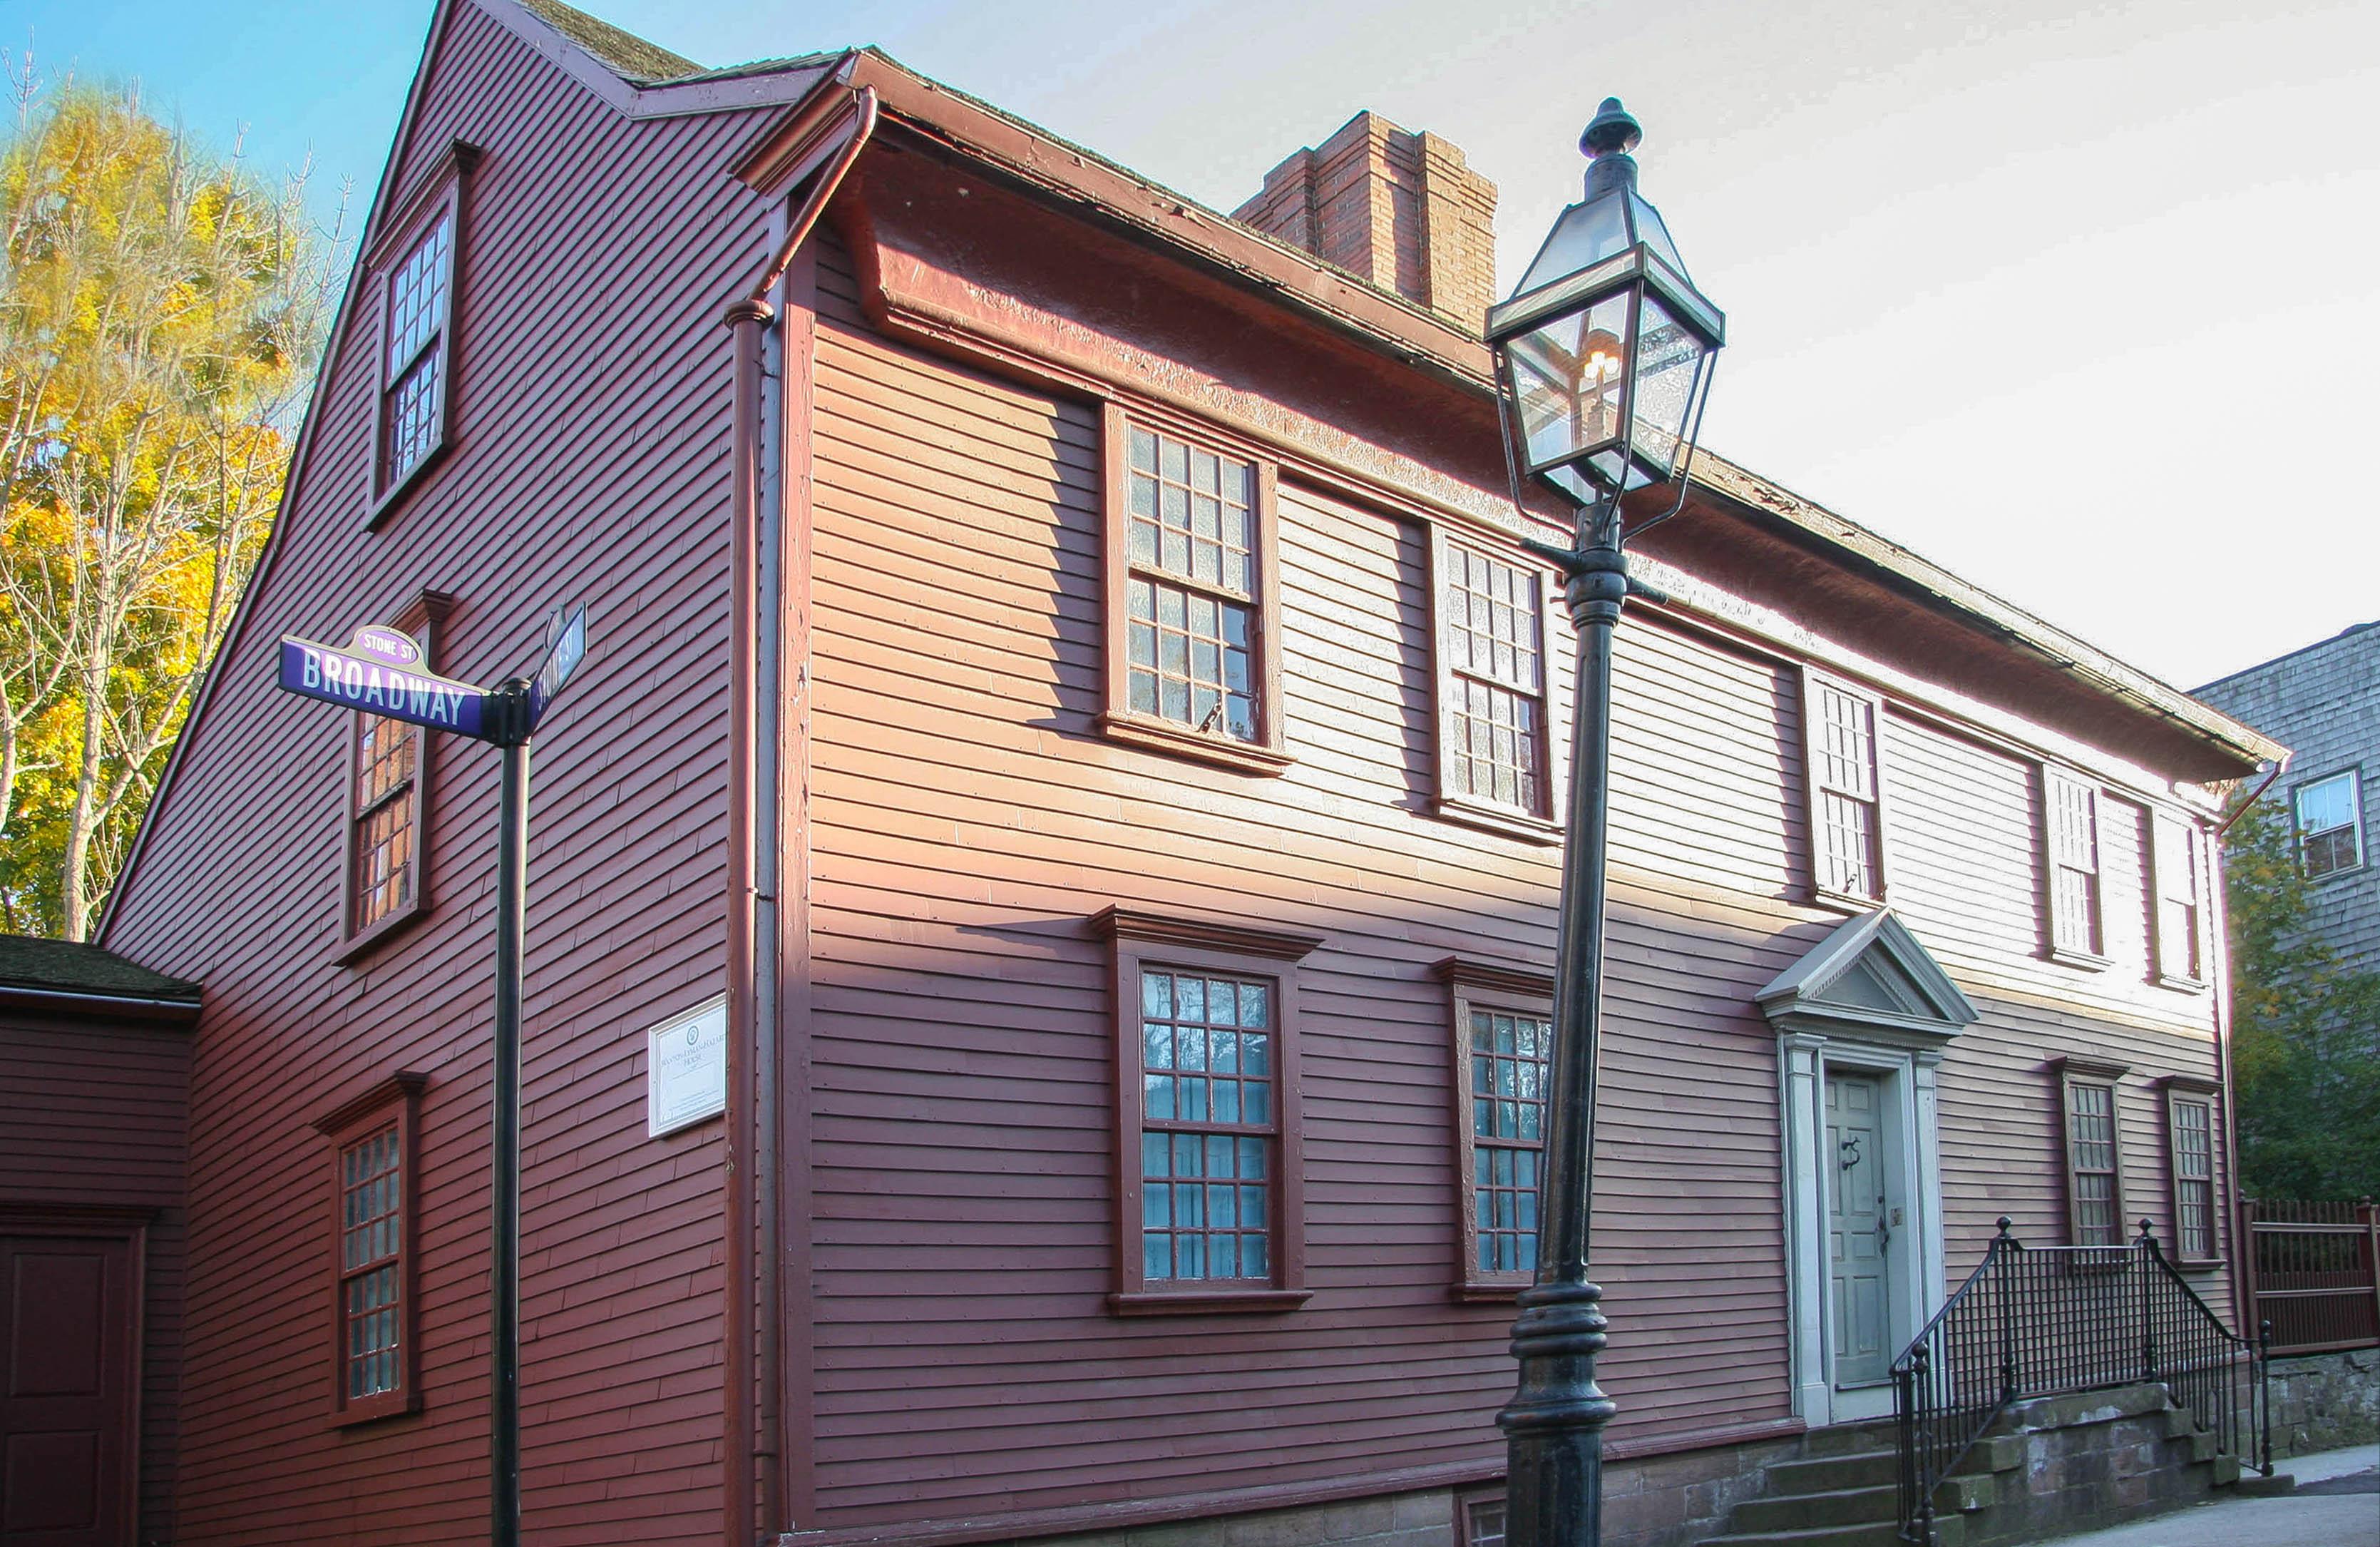 wanton lyman hazard house_credit Discover Newport